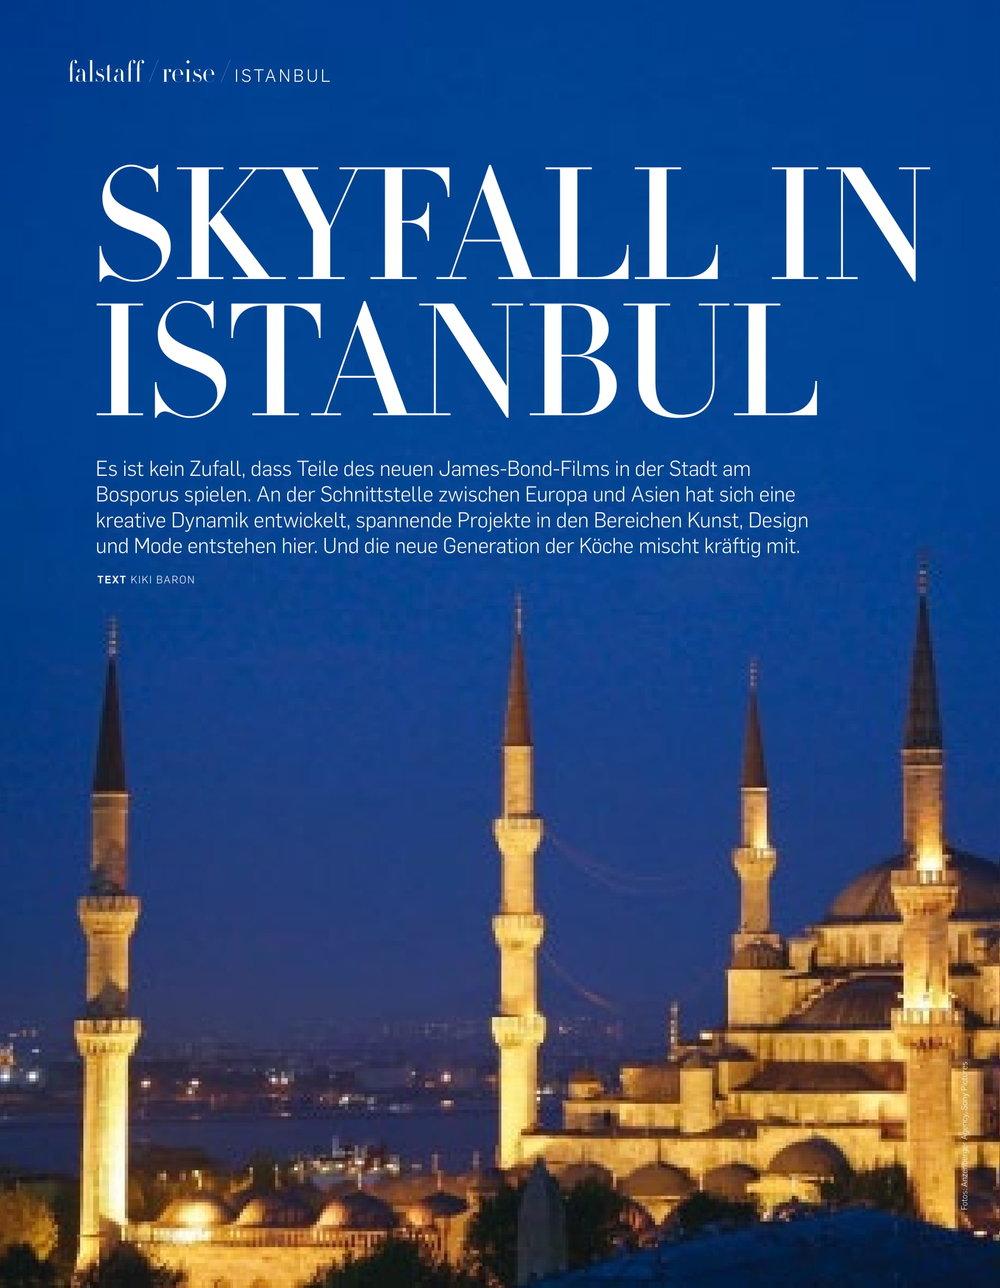 Istanbul Falstaff November 2016